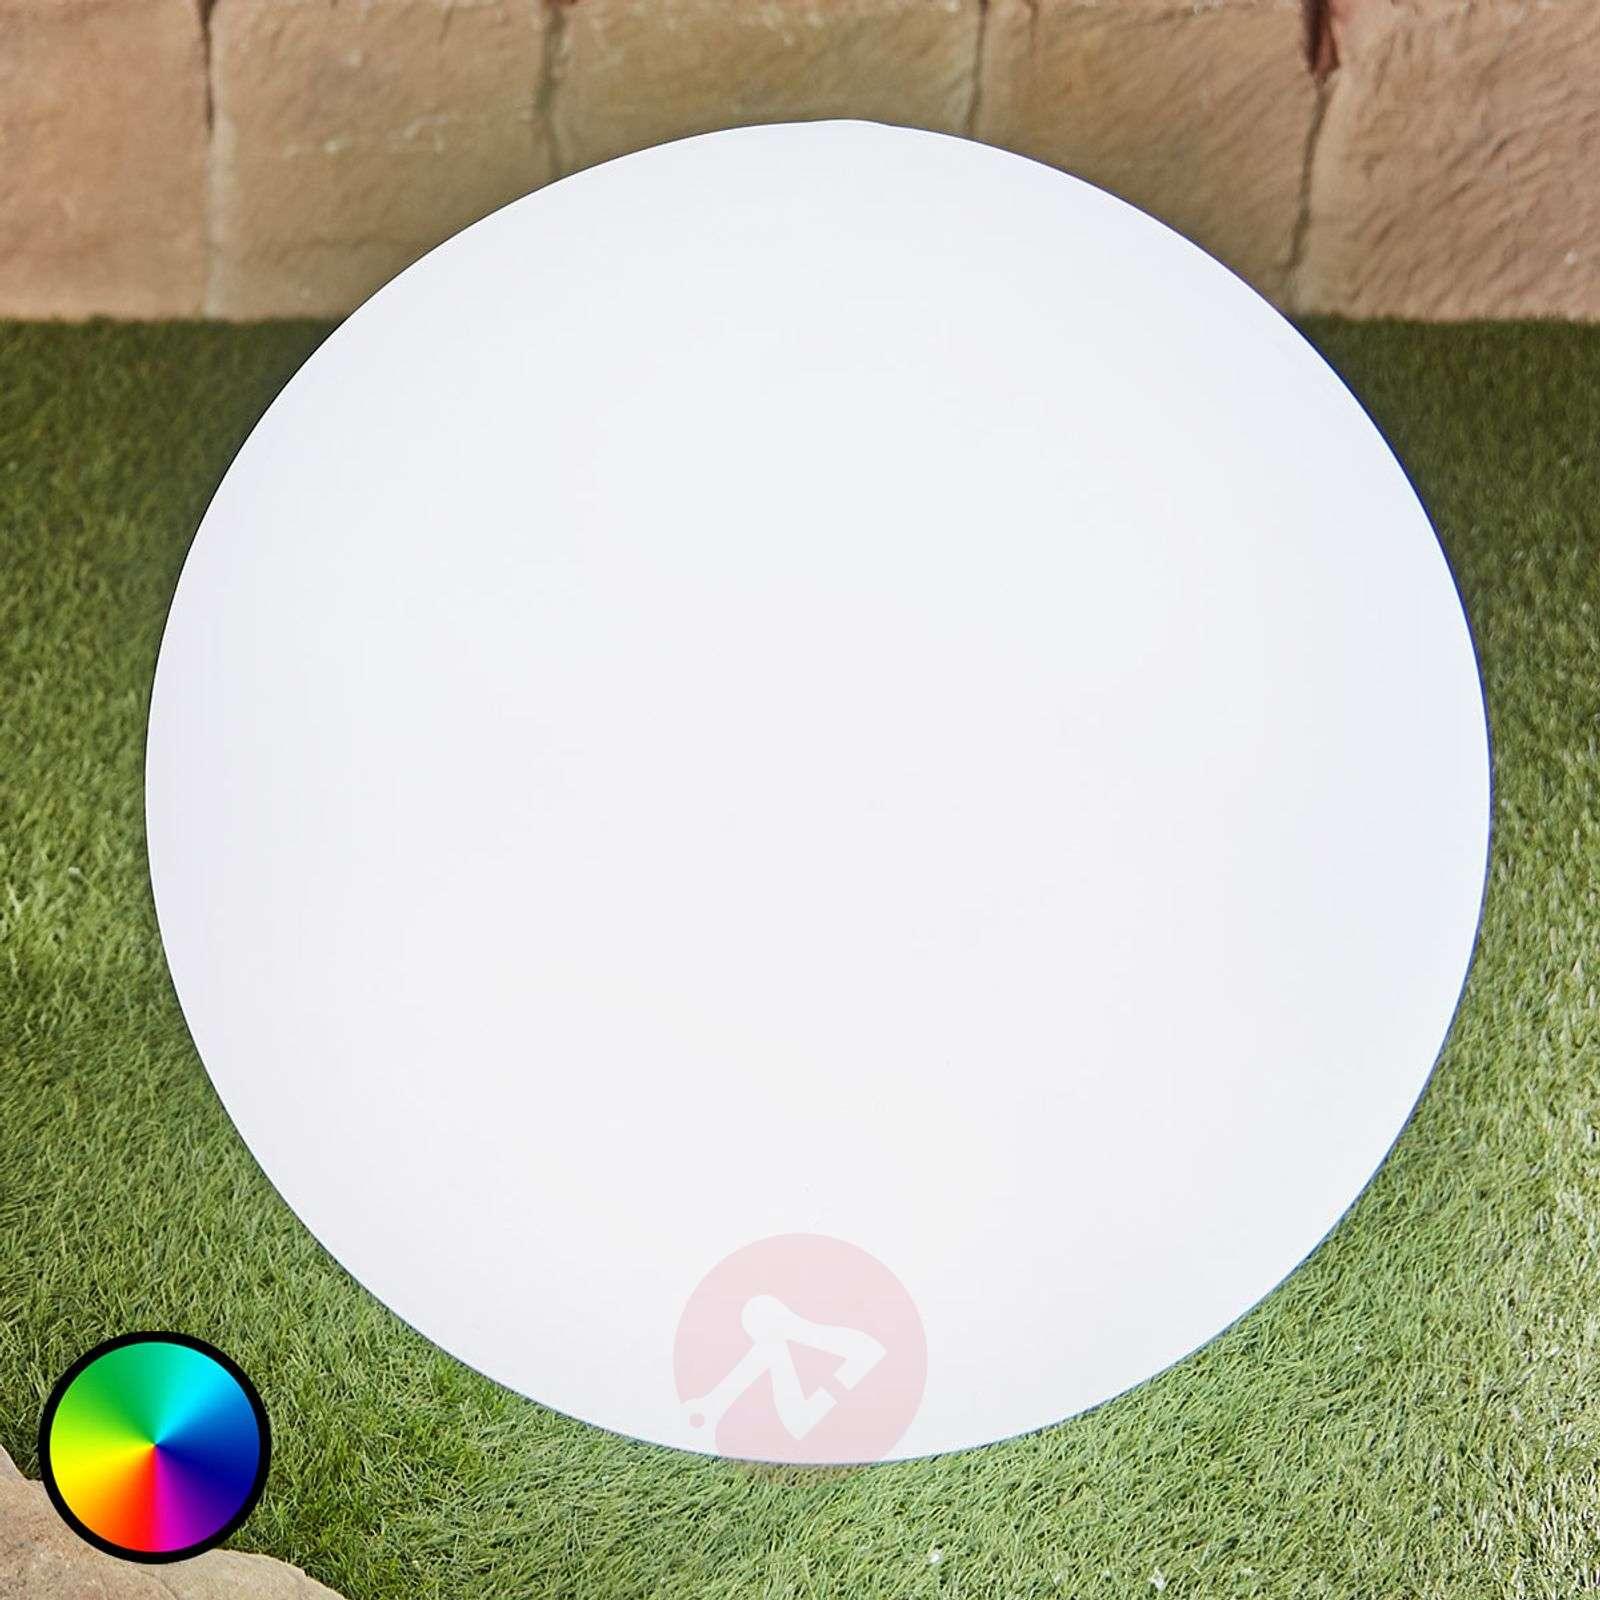 LED-koristeulkovalaisin Tomila, kuula, USB, 60 cm-6729007-01